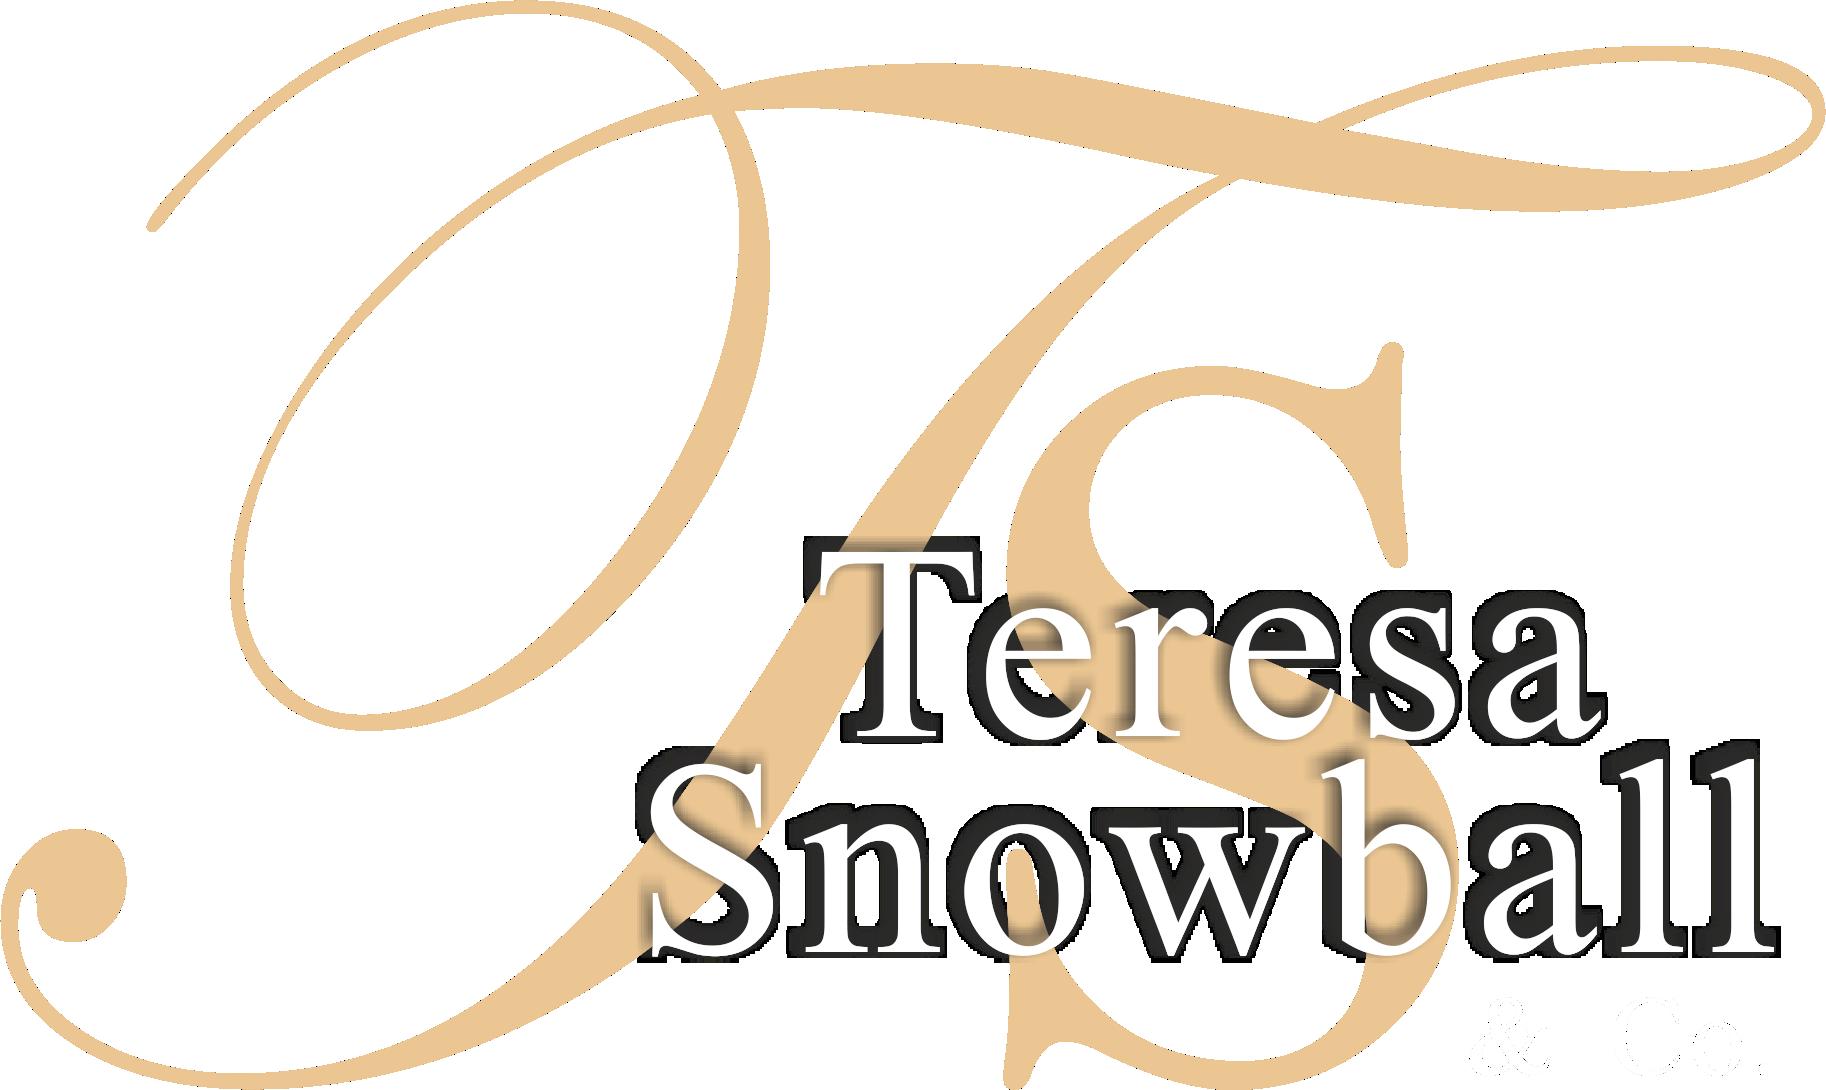 Teresa Snowball